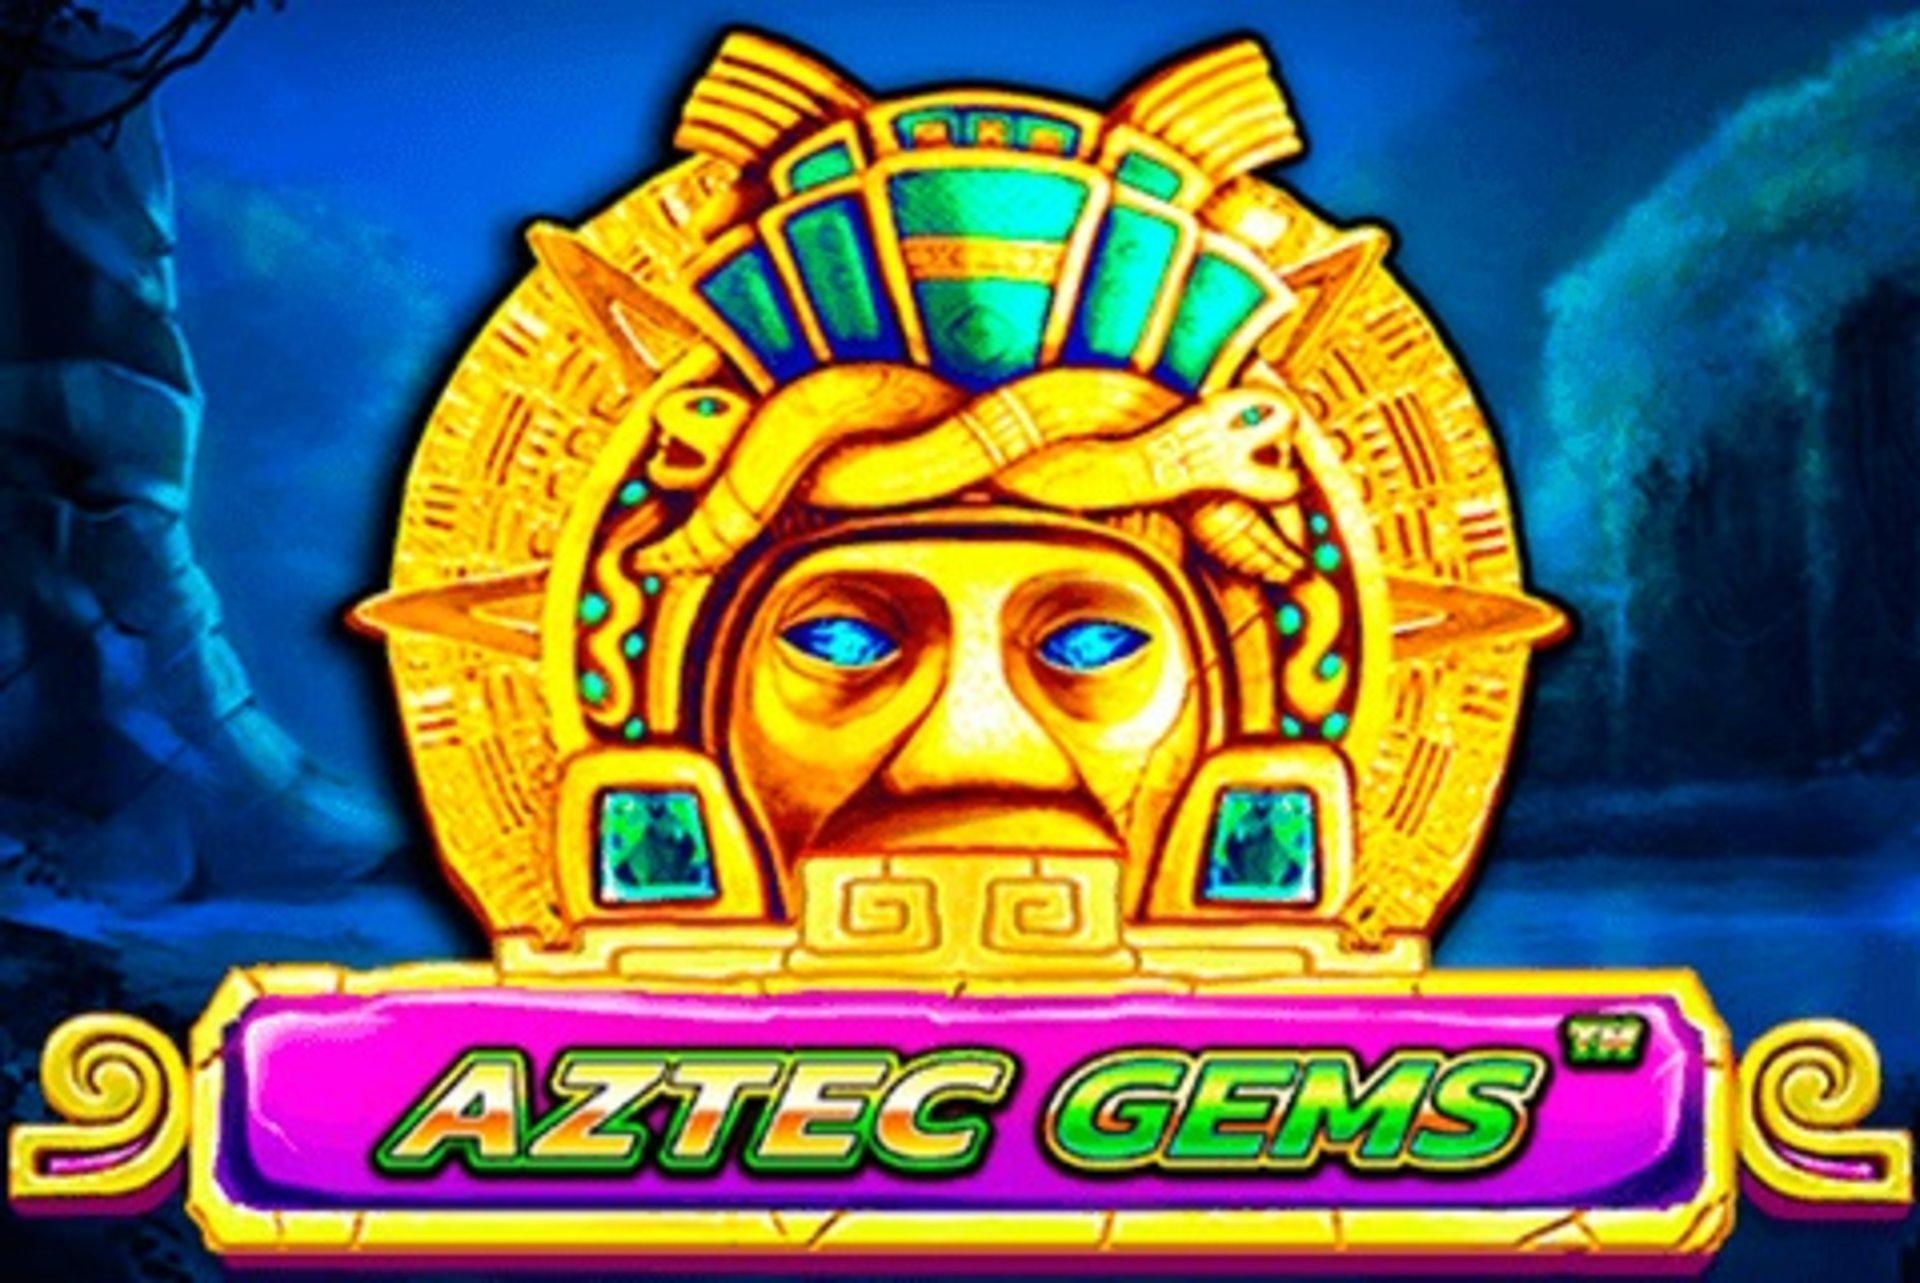 Demo Slot Aztec Gems Provider Pragmatic Lansung Jackpot Museumslot